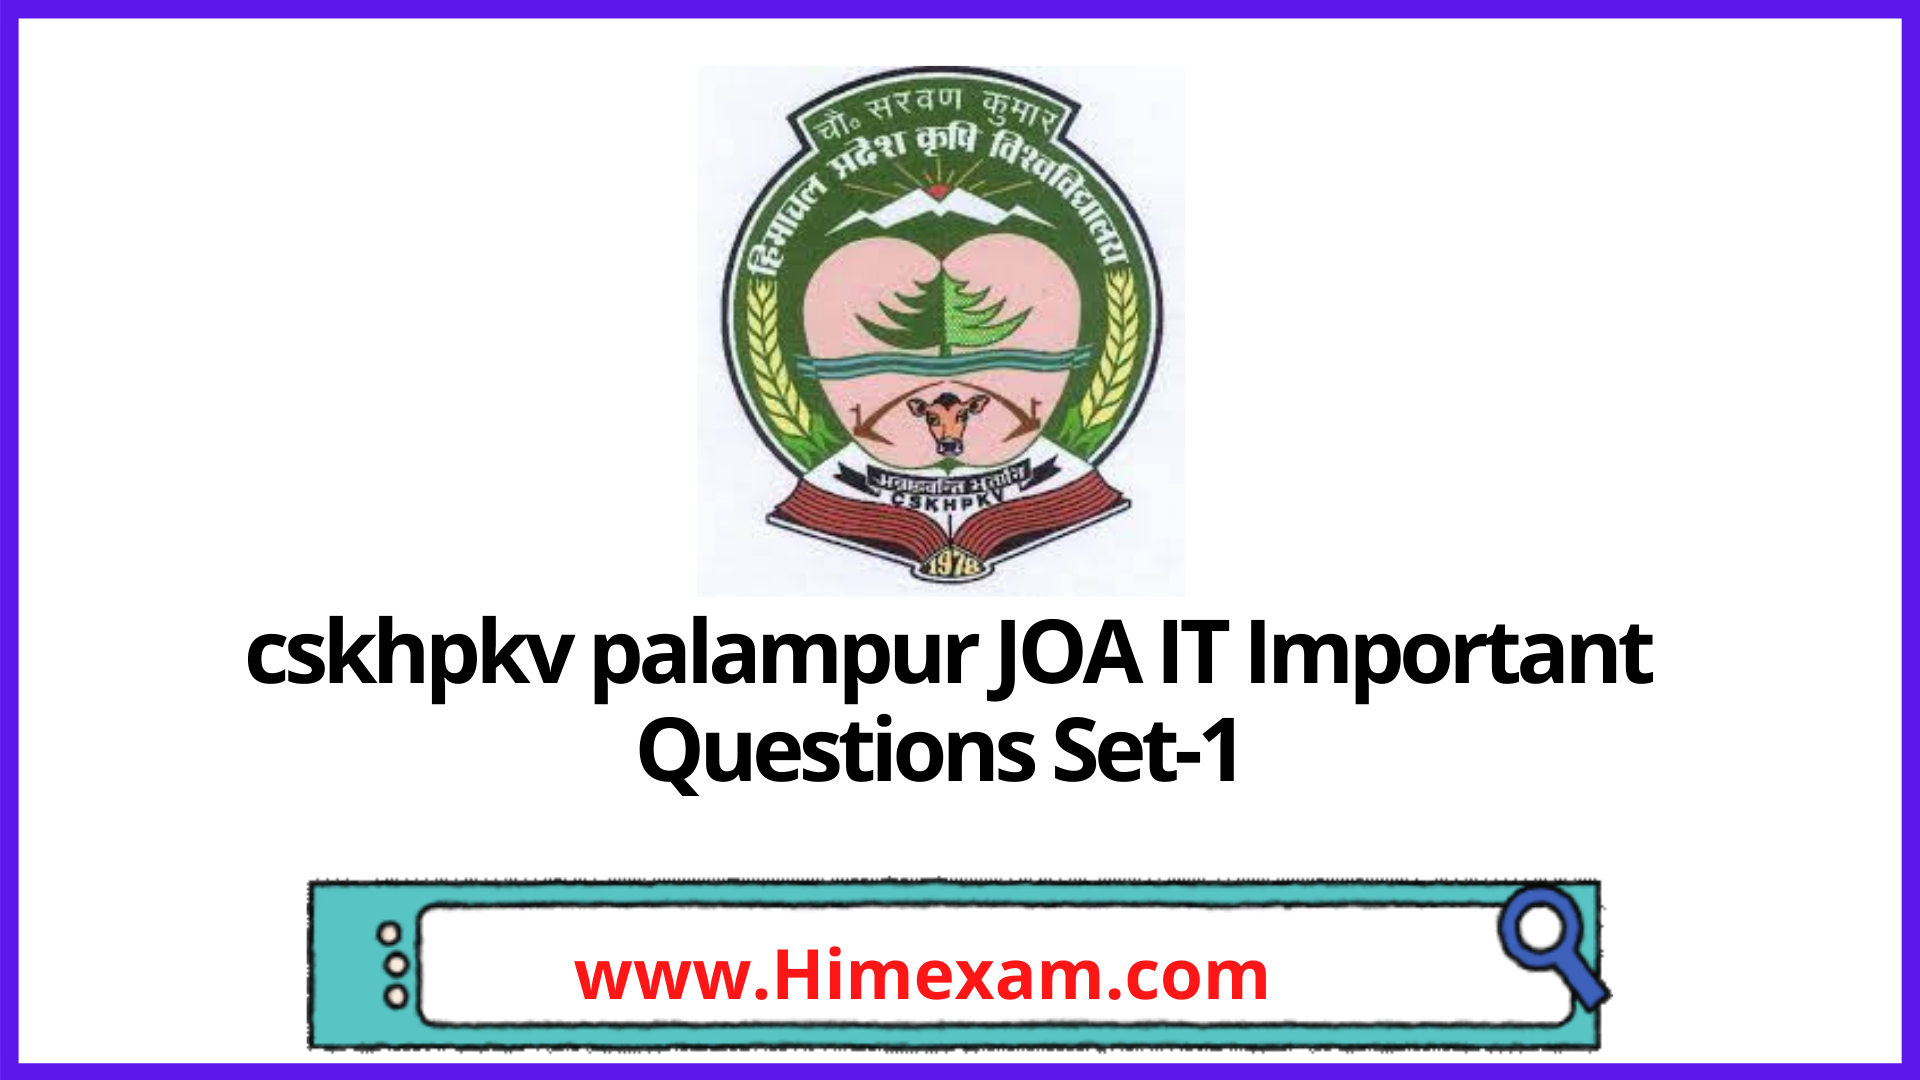 cskhpkv palampur JOA IT Important Questions Set-1